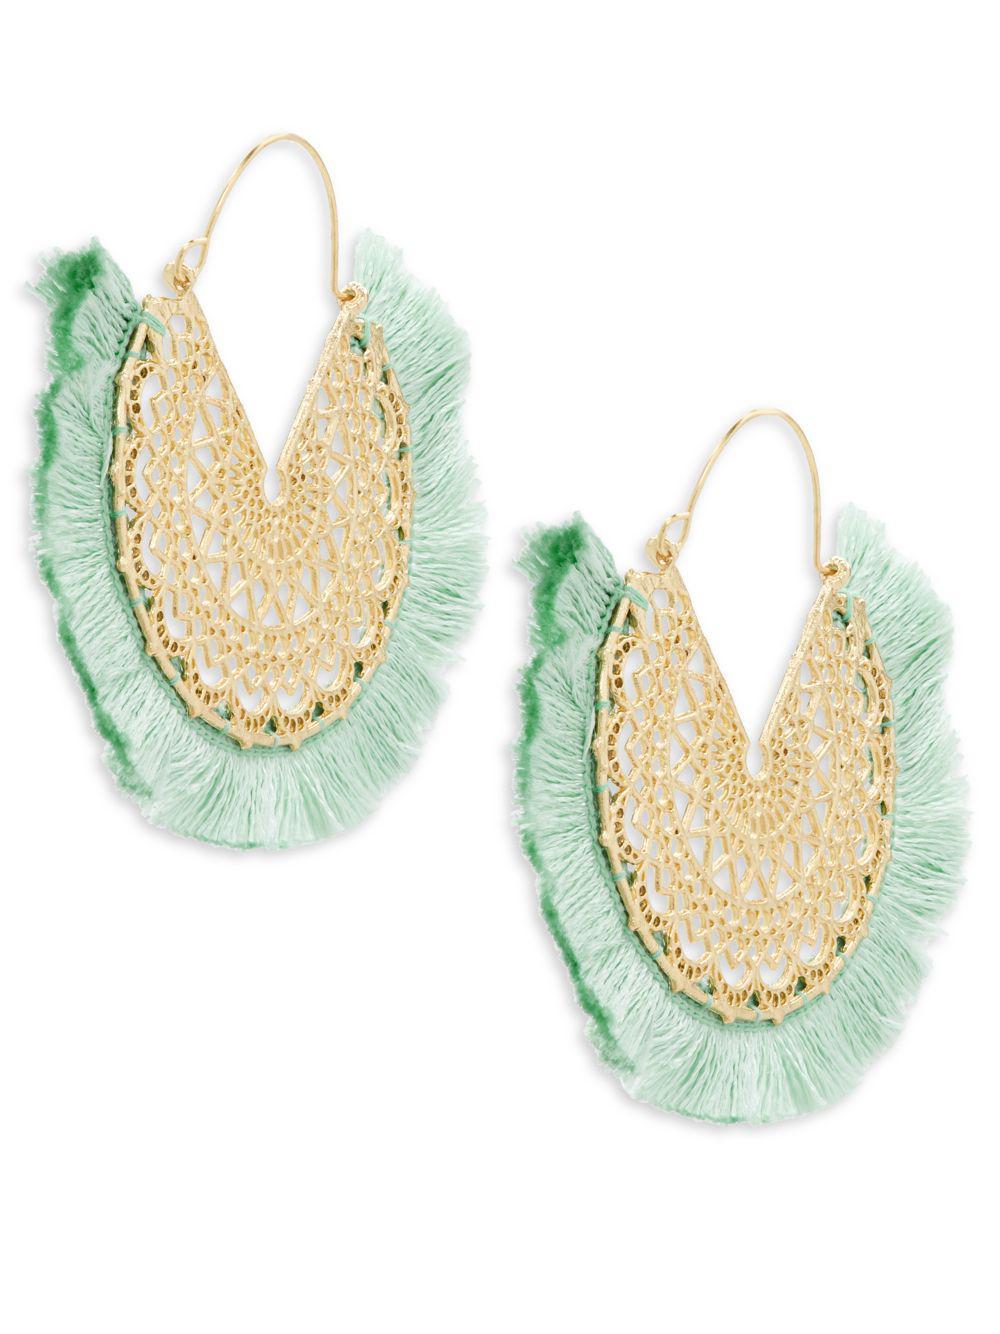 Panacea Filigree Fringe Drop Earrings FGV4hn4hl